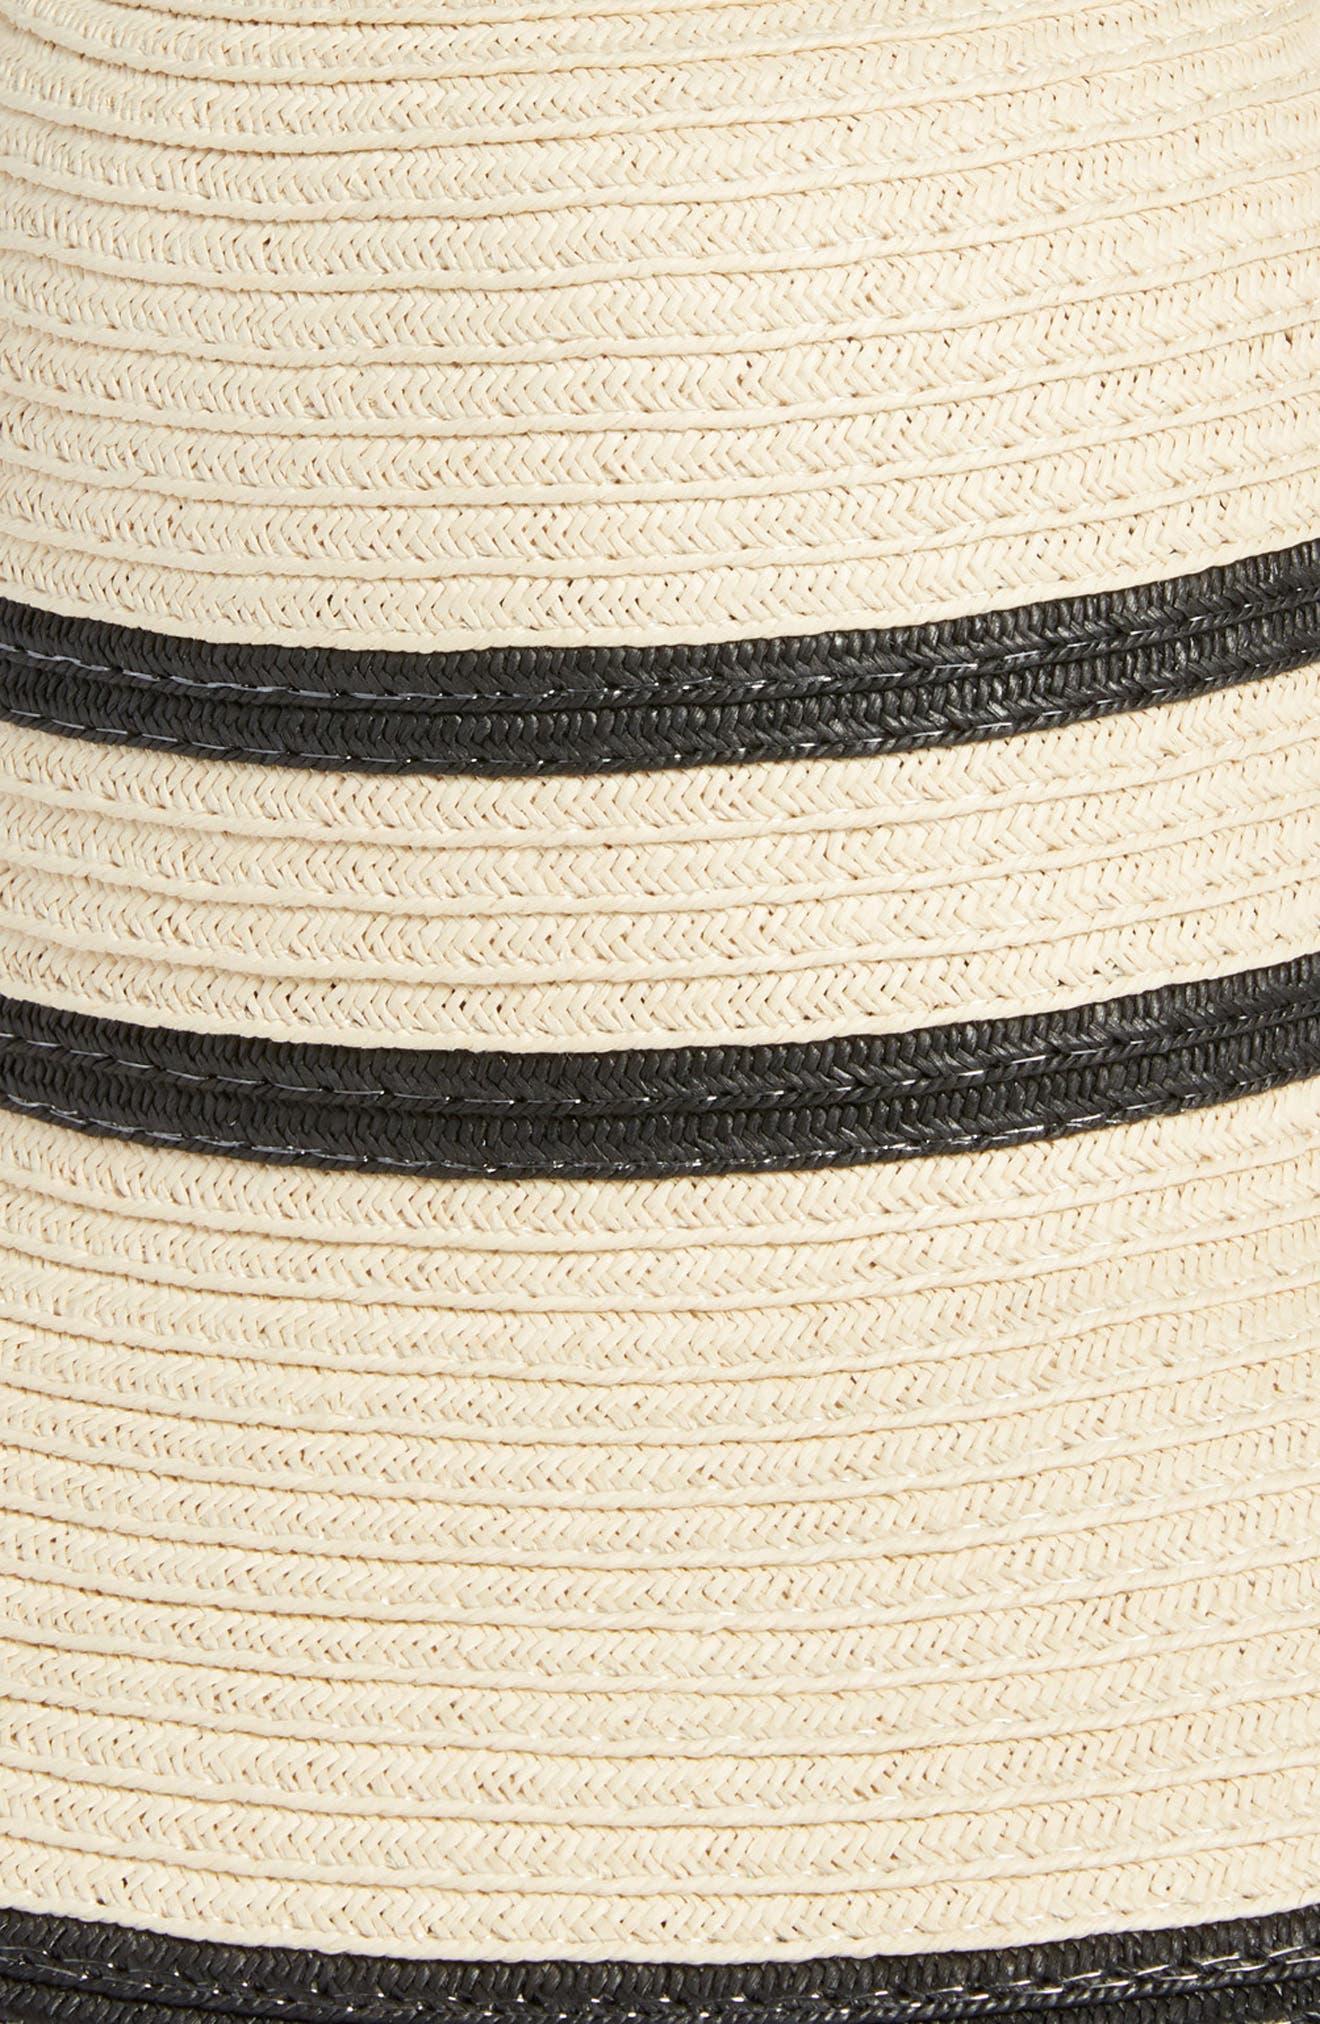 Bondi Straw Cloche Hat,                             Alternate thumbnail 2, color,                             Stone